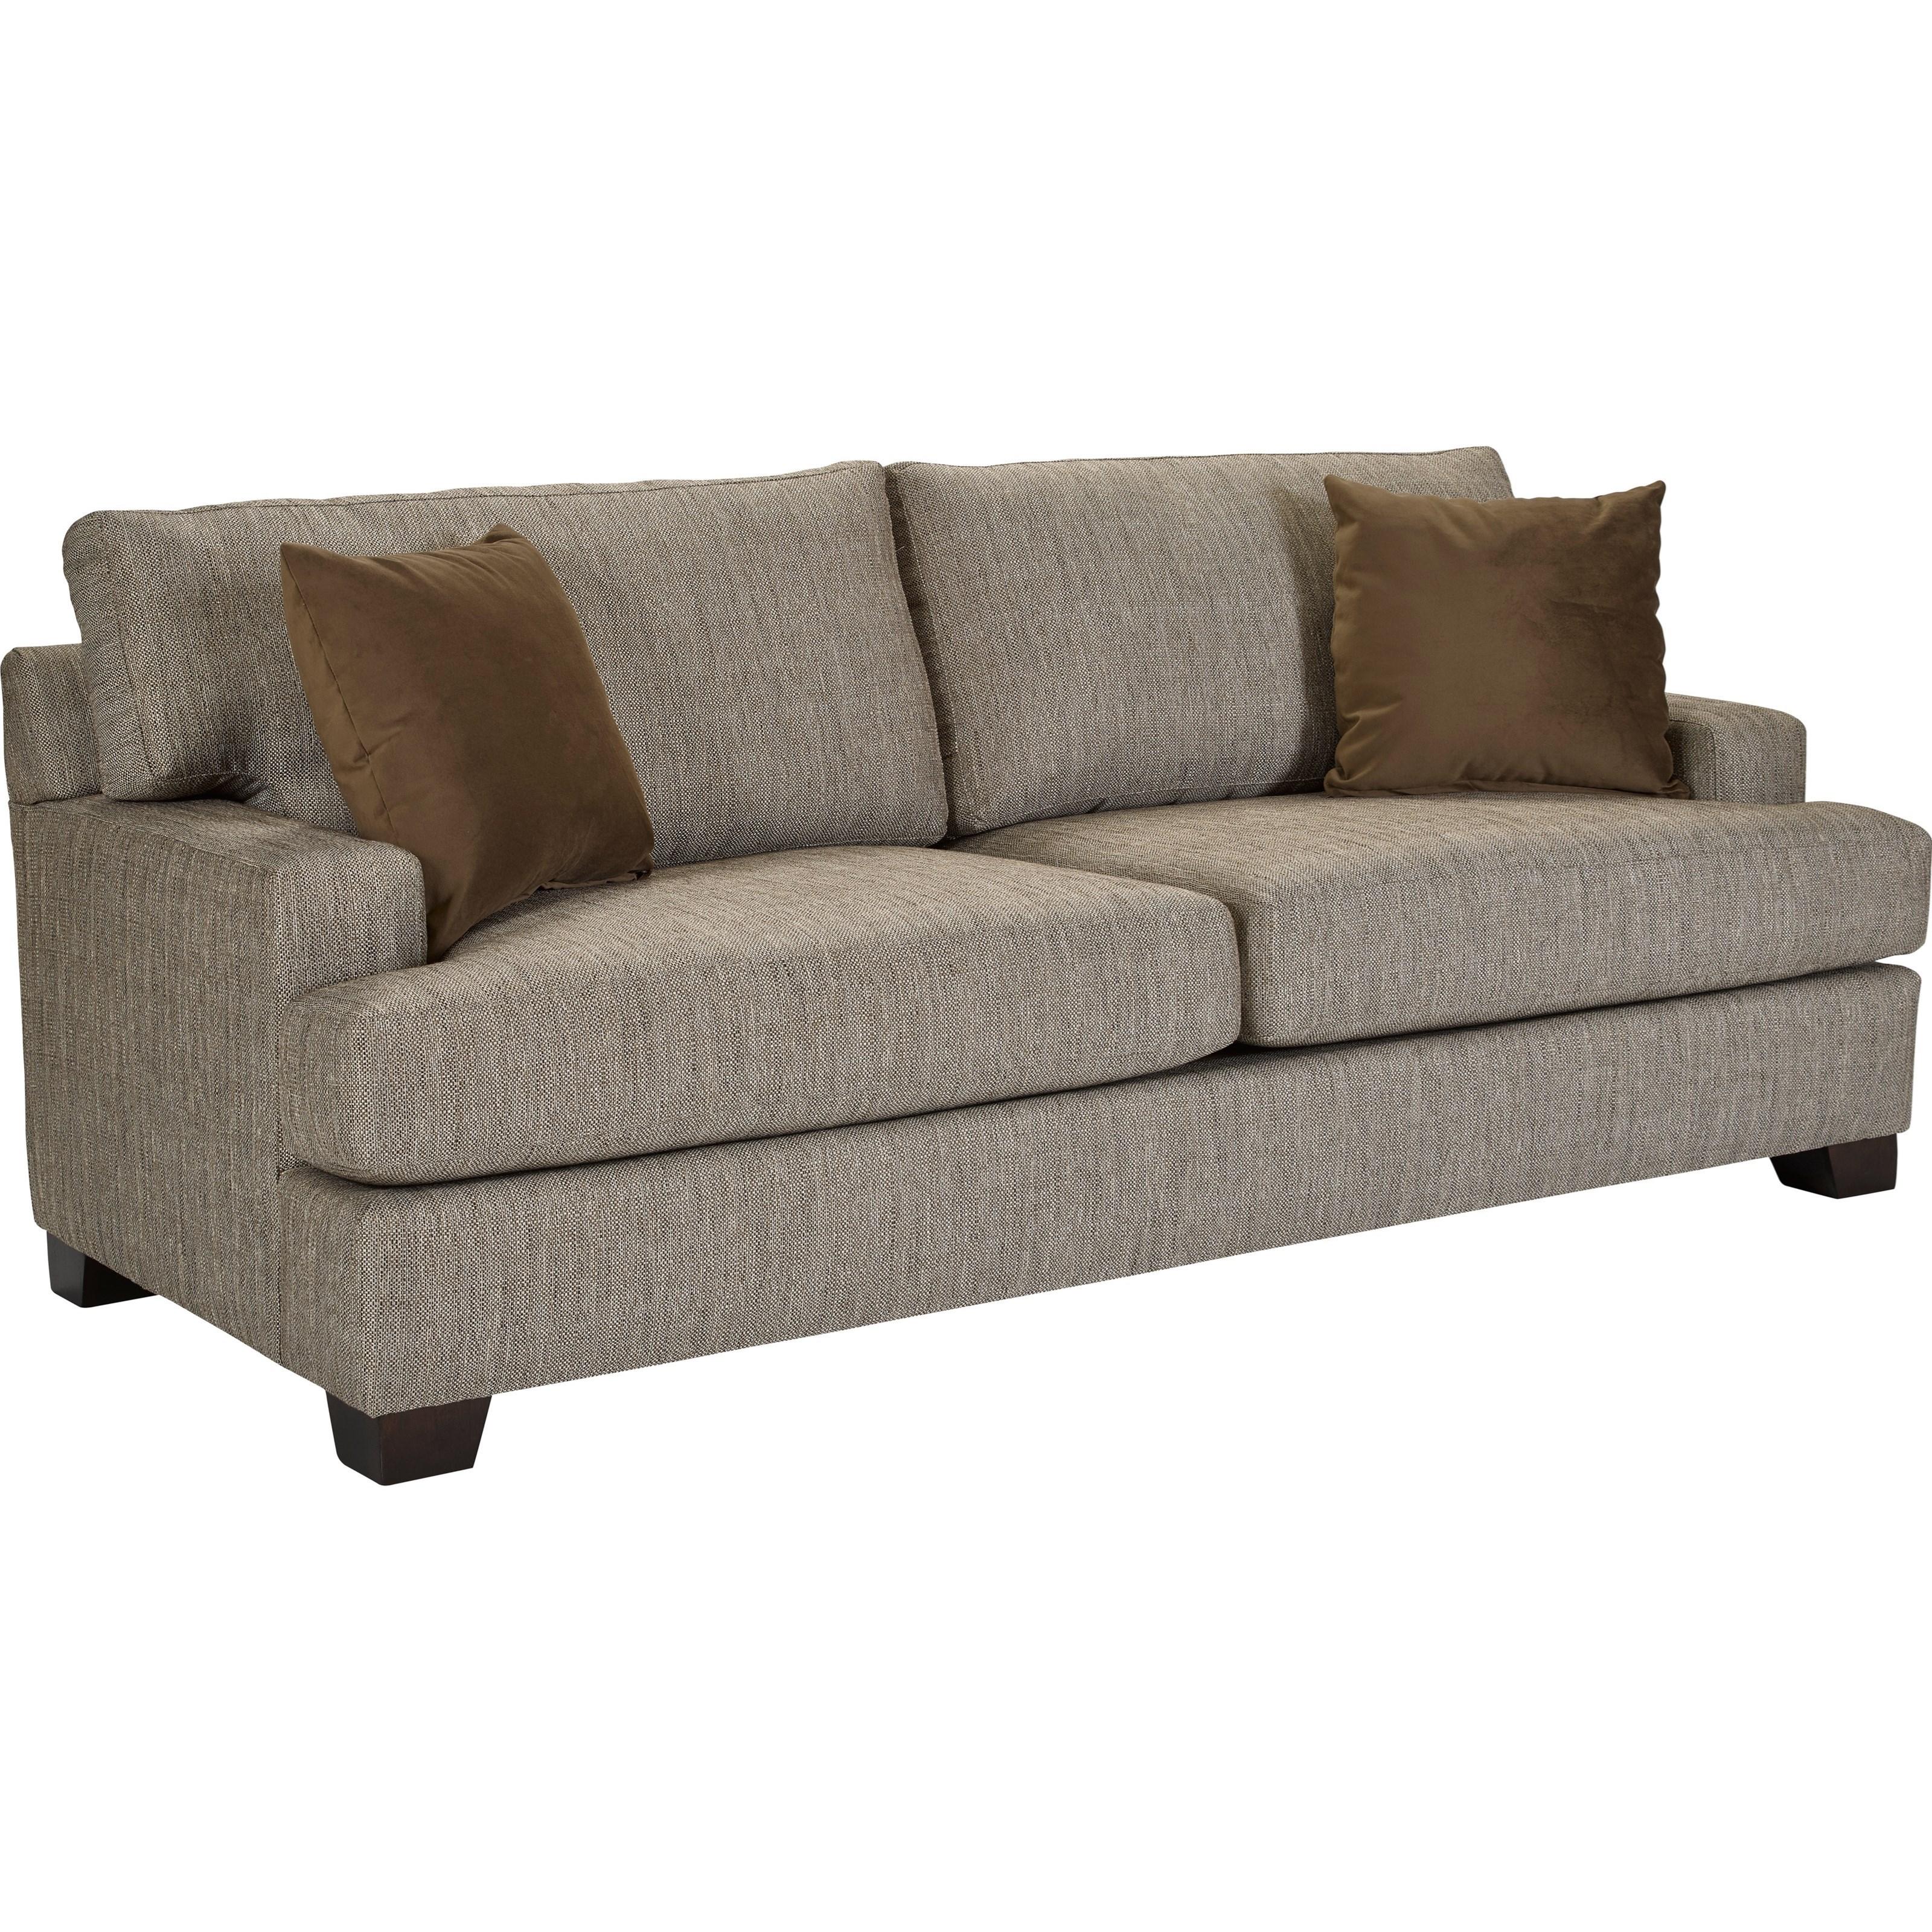 Broyhill Furniture NashSofa